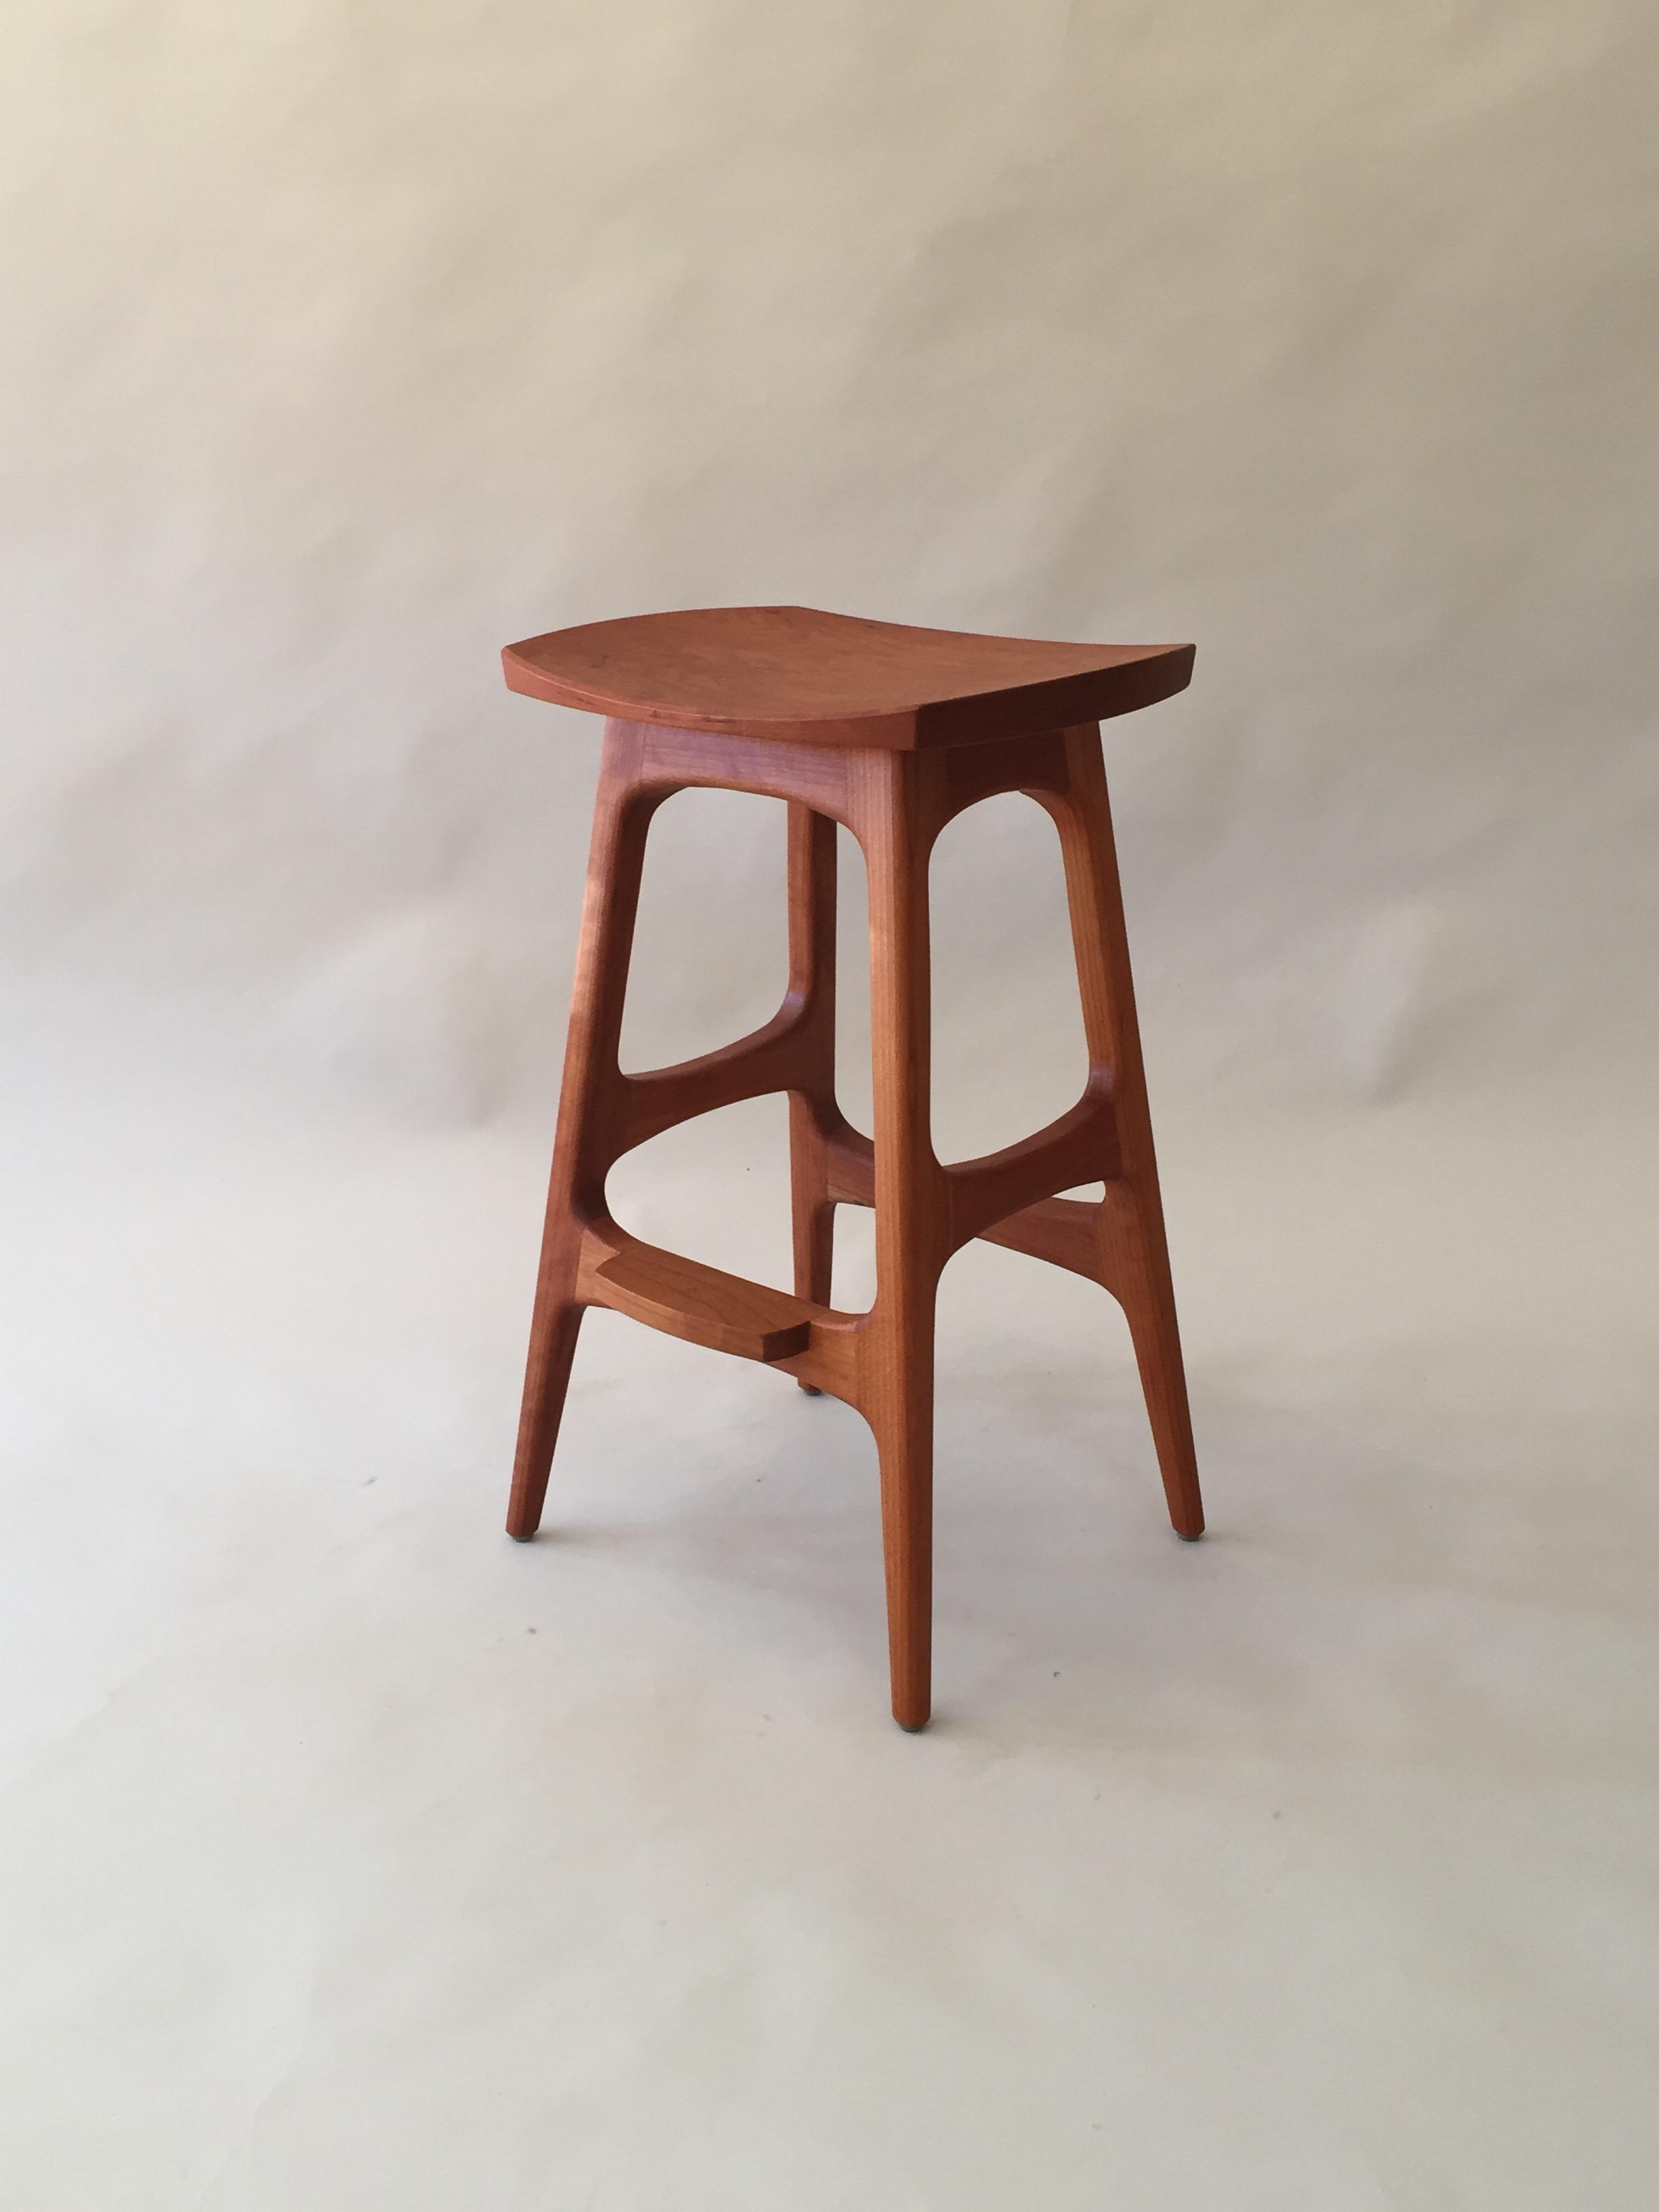 kitchen stool base cabinets unfinished wegner joseph van benten furnituremakers img 1044 jpg